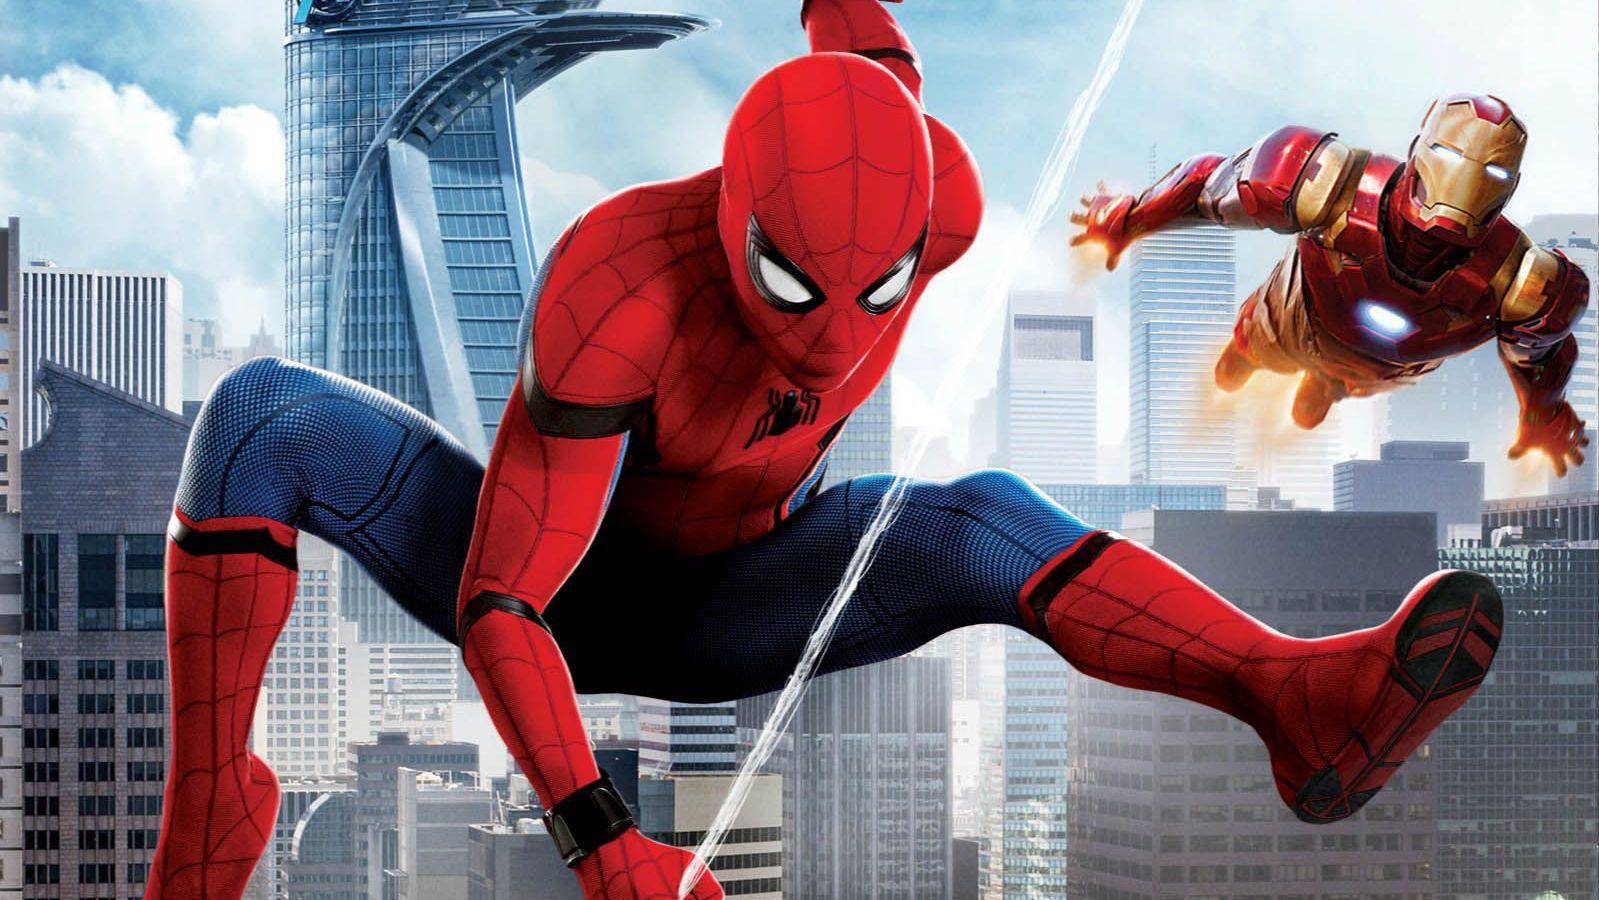 SpidermanHomecoming_2017_BD_ORING_FrontFlat1-1504626518 F